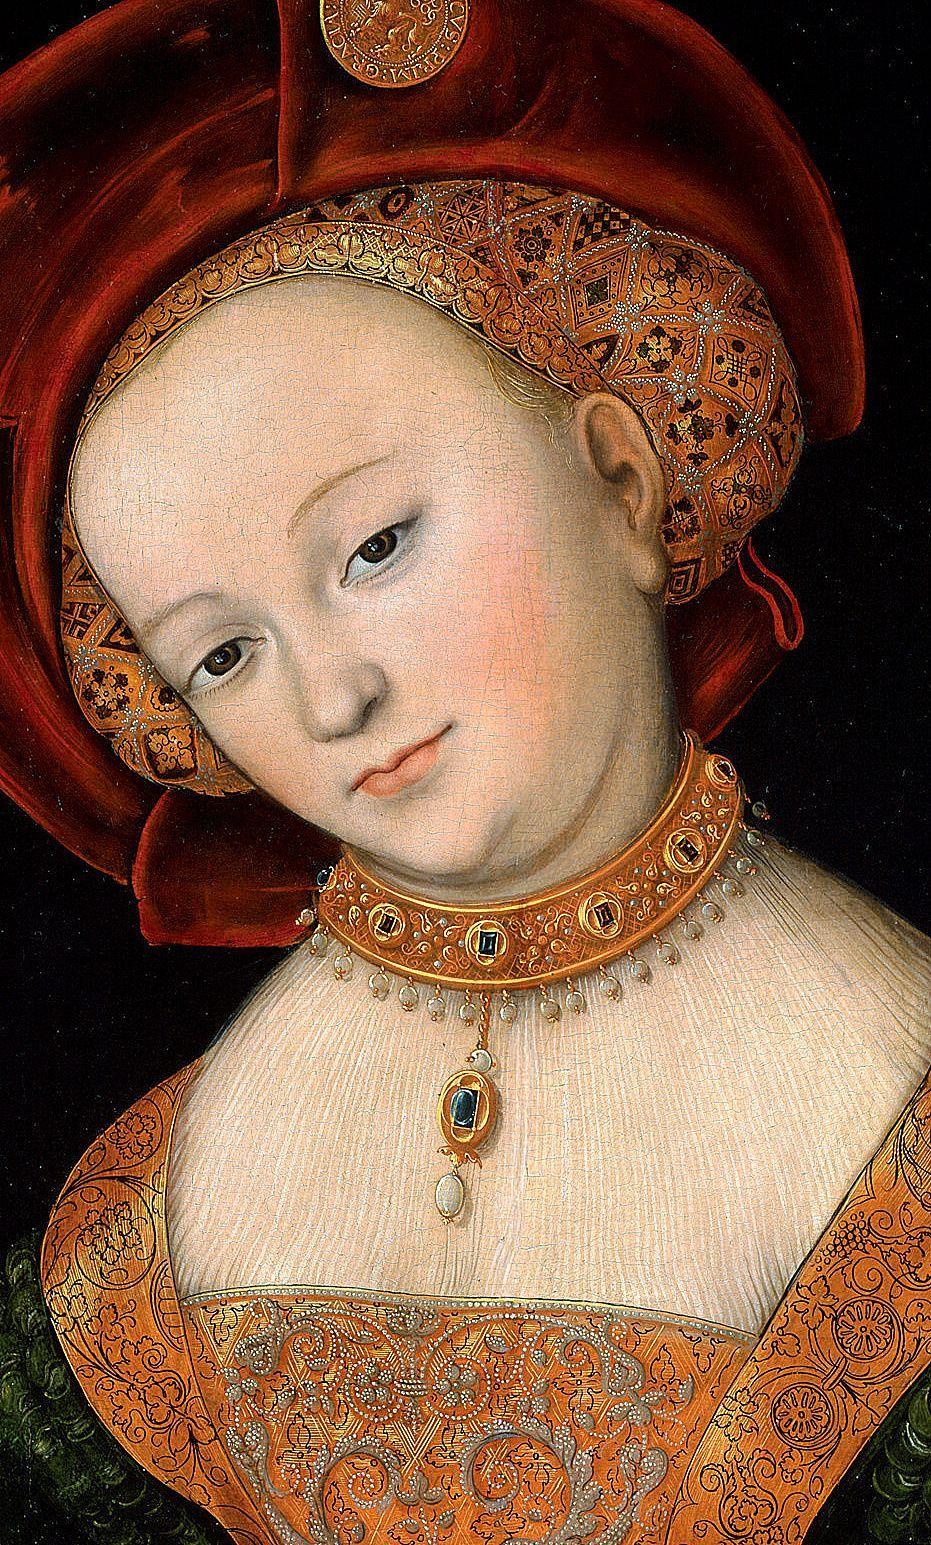 Lucas Cranach the Elder: Лукас Кранах \ Династия художников раннего Возр...